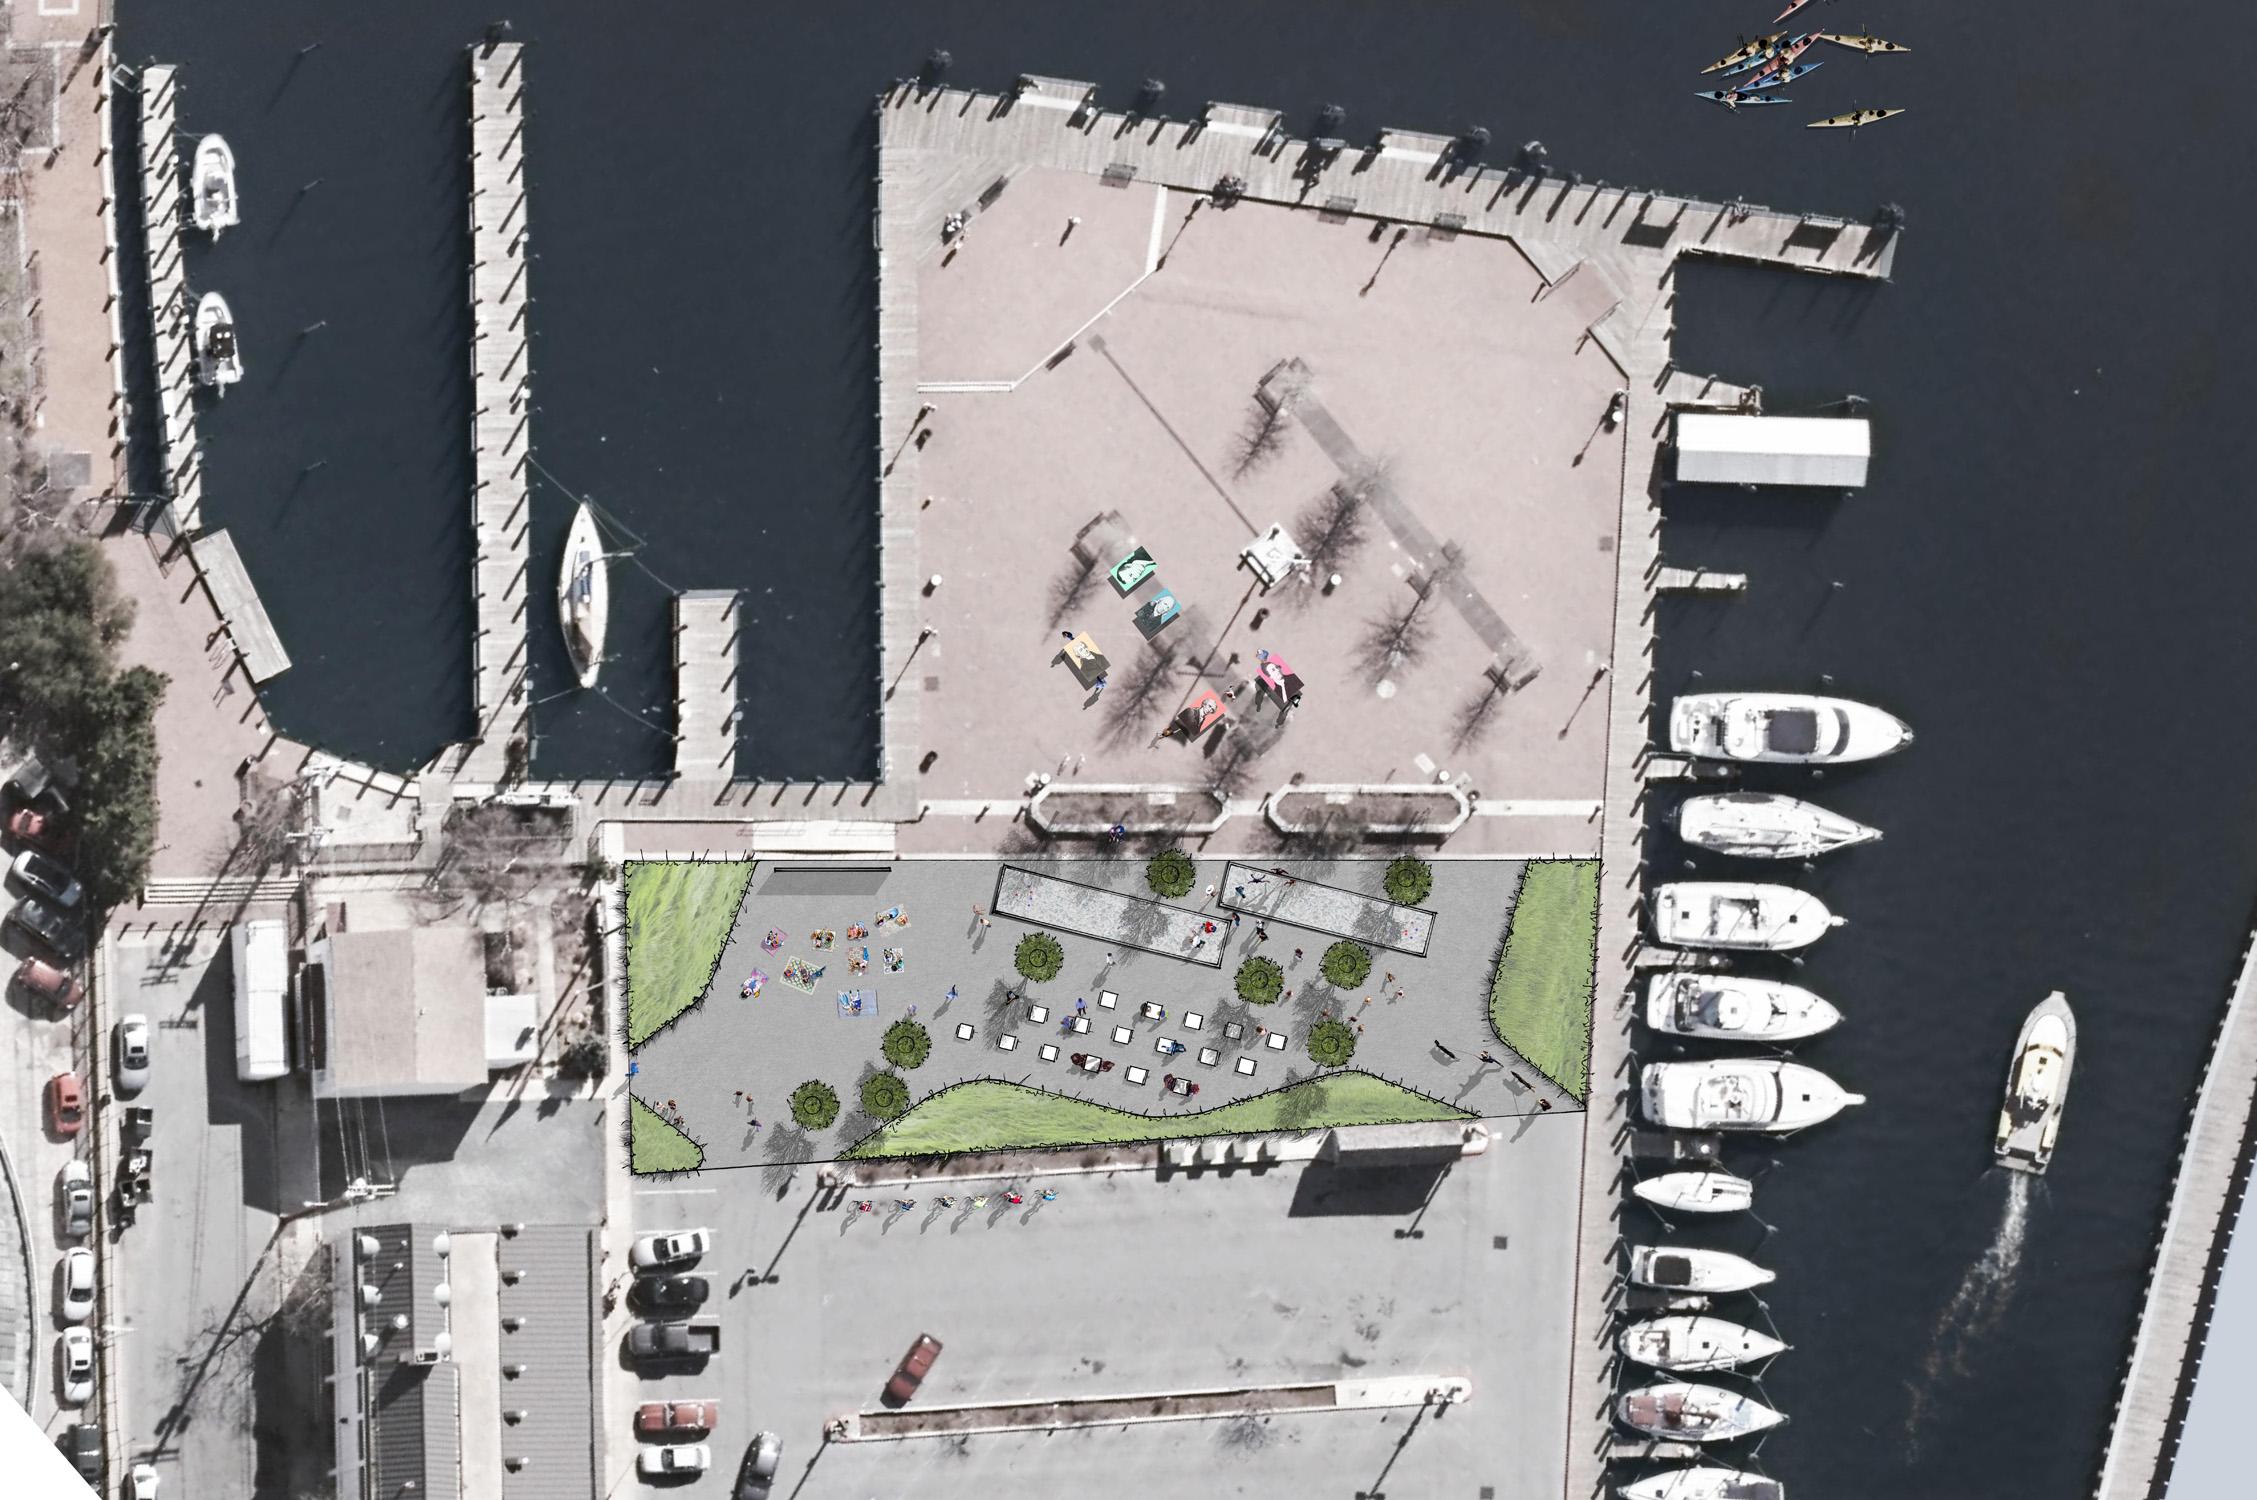 CITY DOCK_ConceptPlan-Aerial 1.jpg